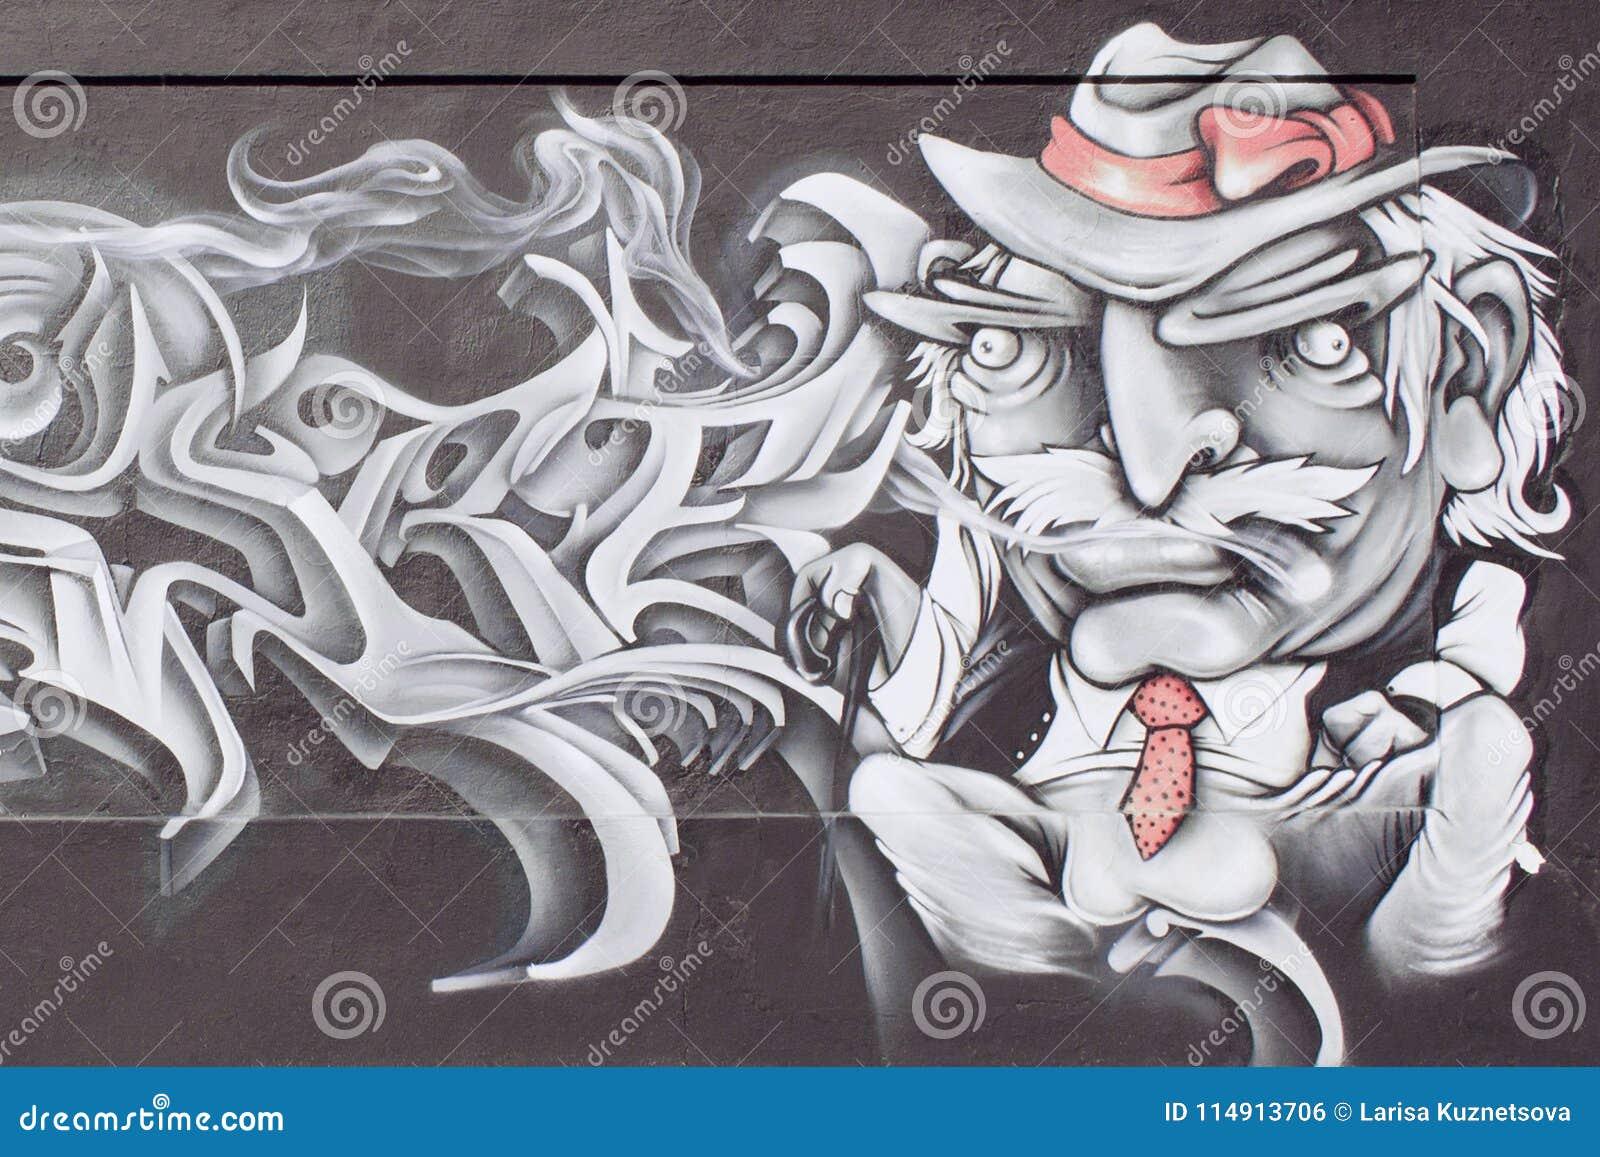 Graffiti By American Writer Mark Twain